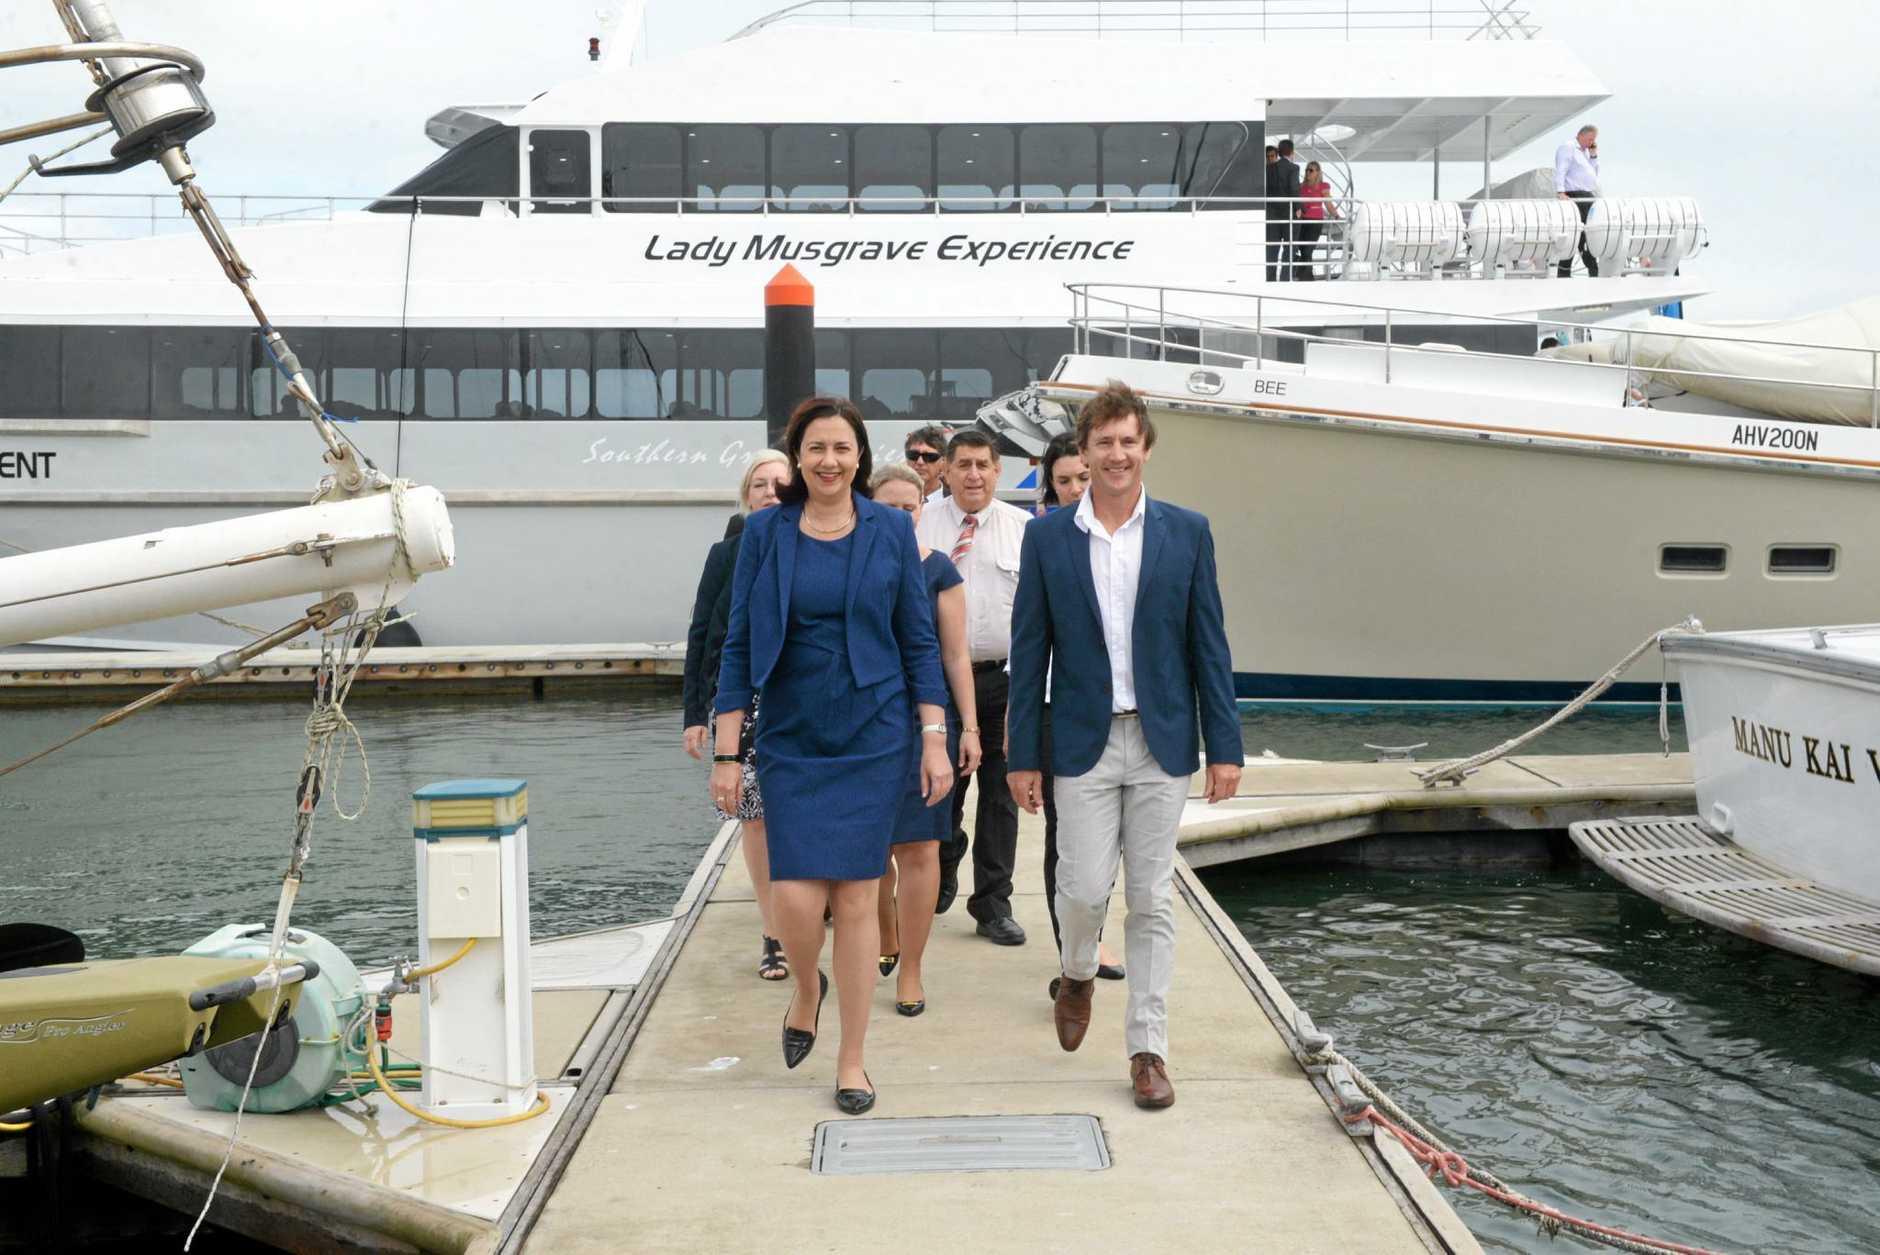 THE PLAN: Queensland premier Annastacia Palaszczuk visiting the Port of Bundaberg.